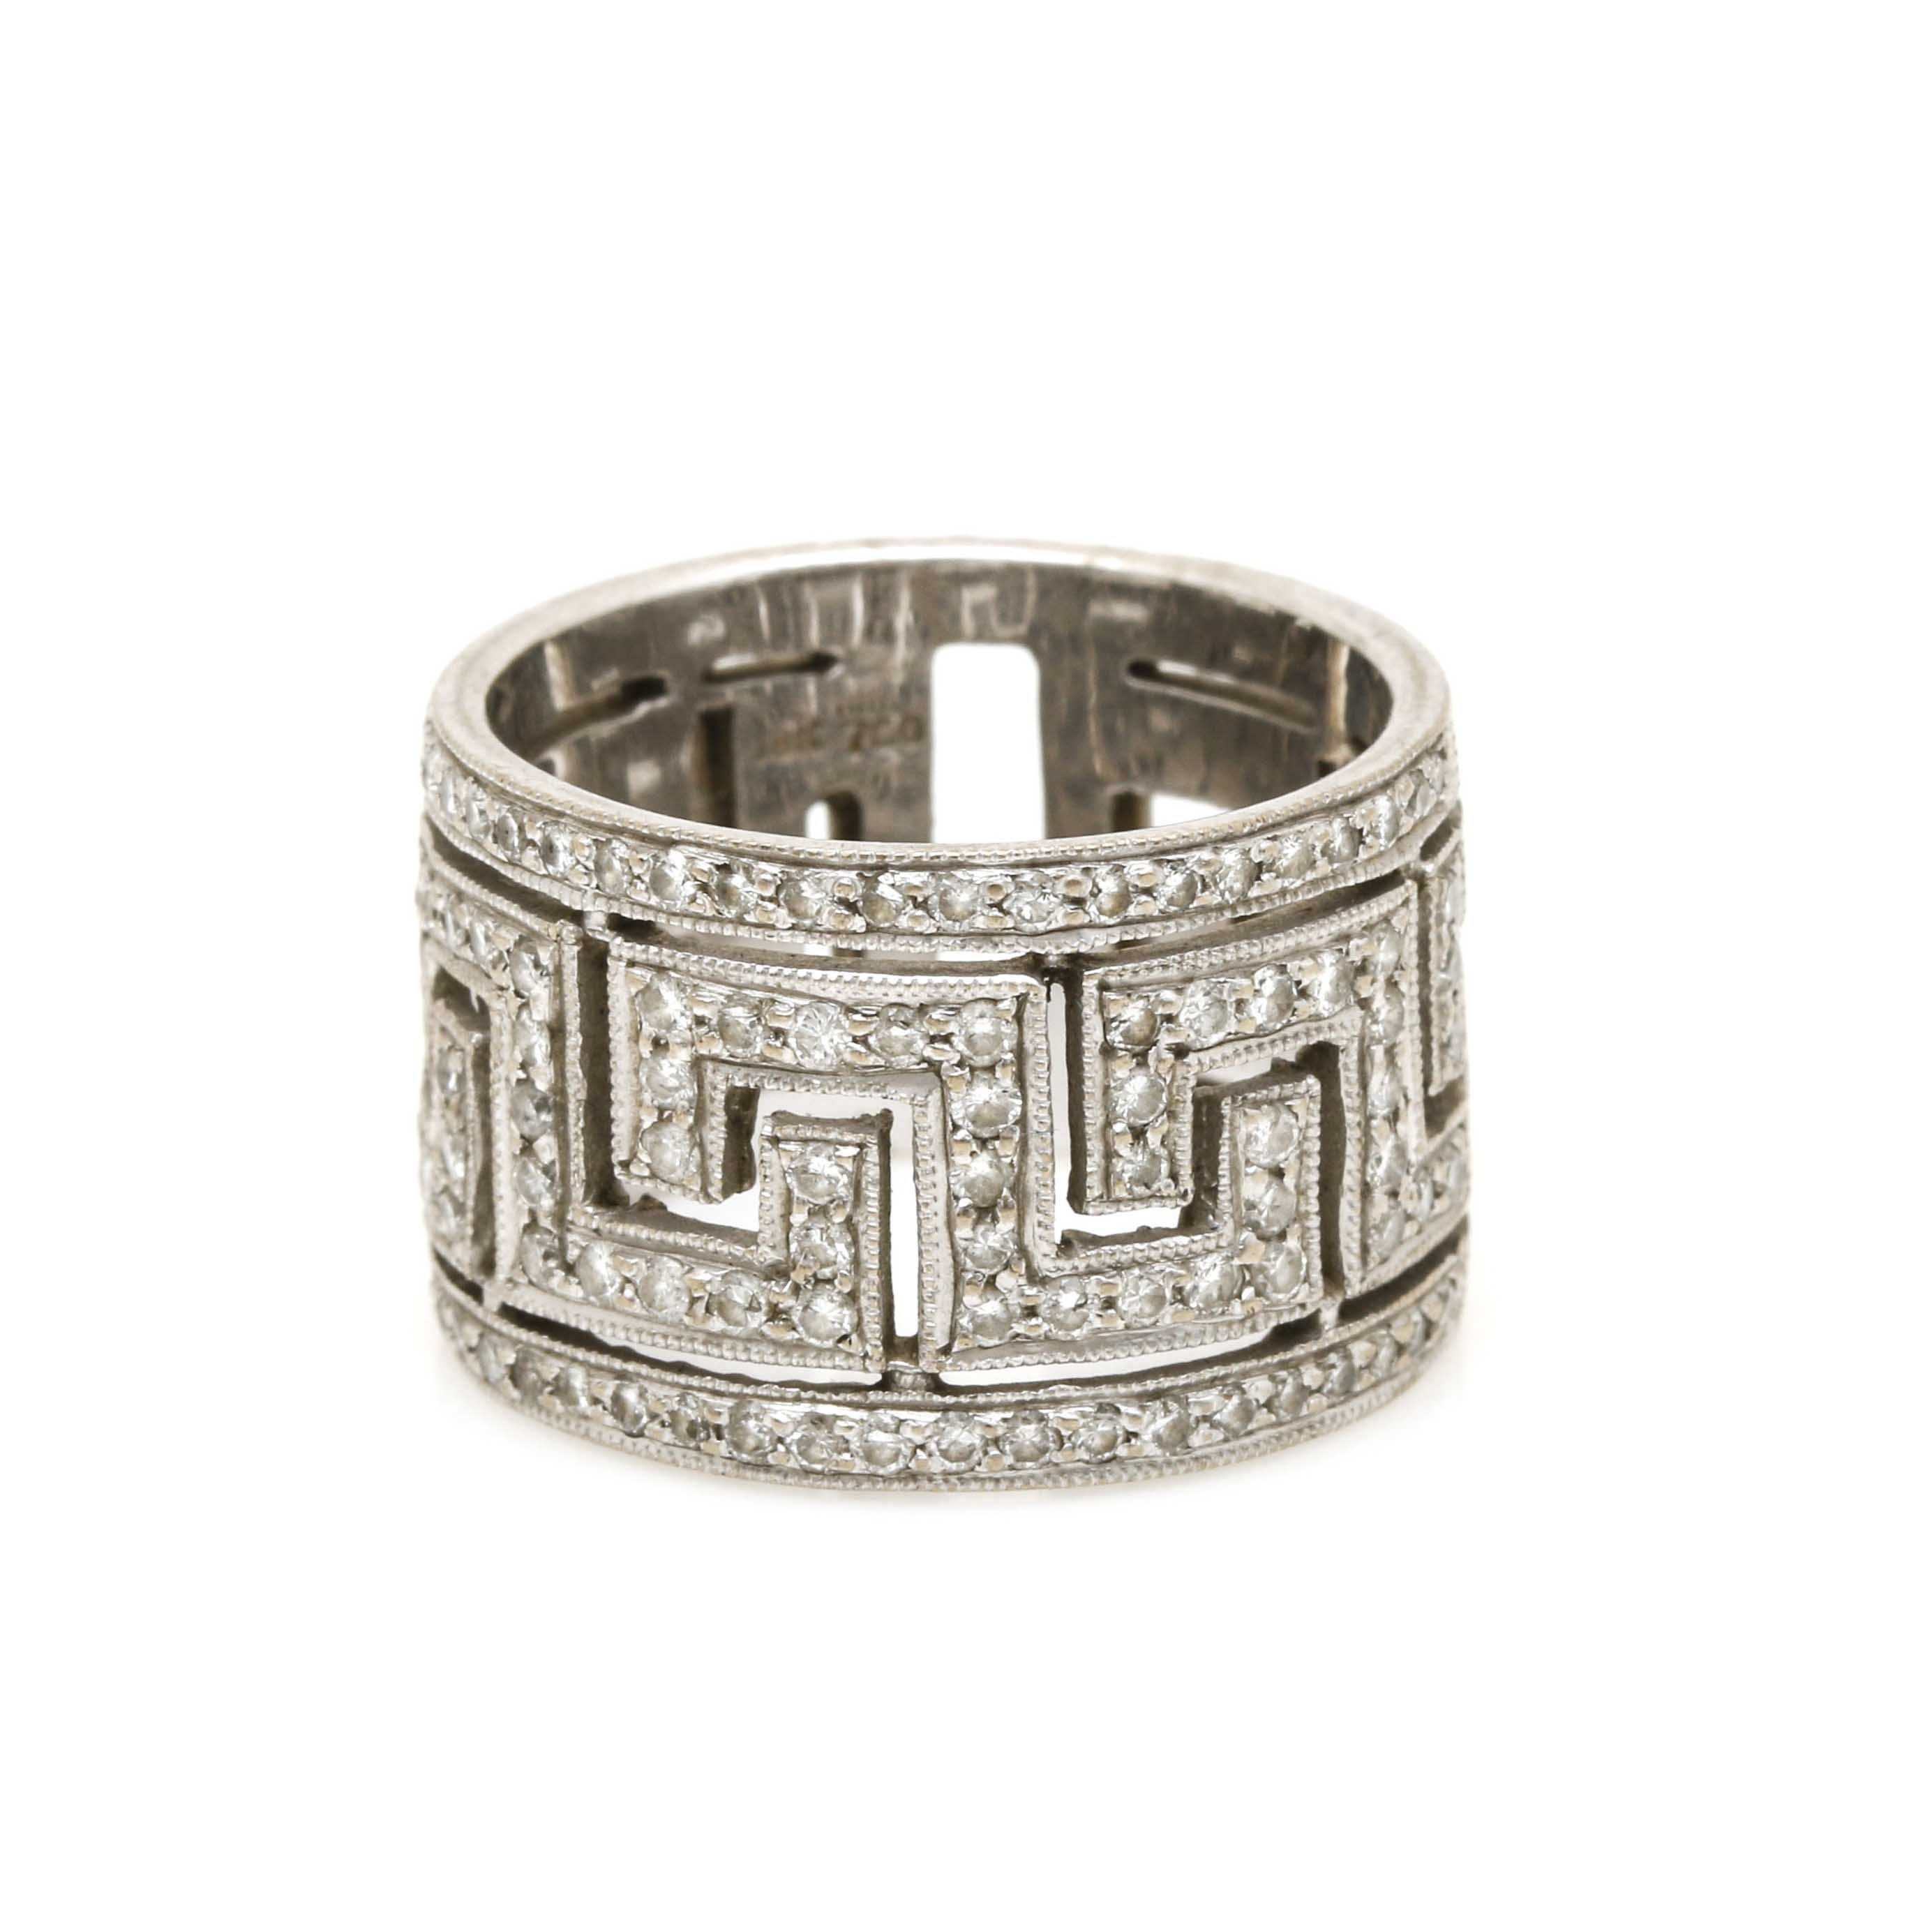 18K White Gold Diamond Greek Key Ring Band